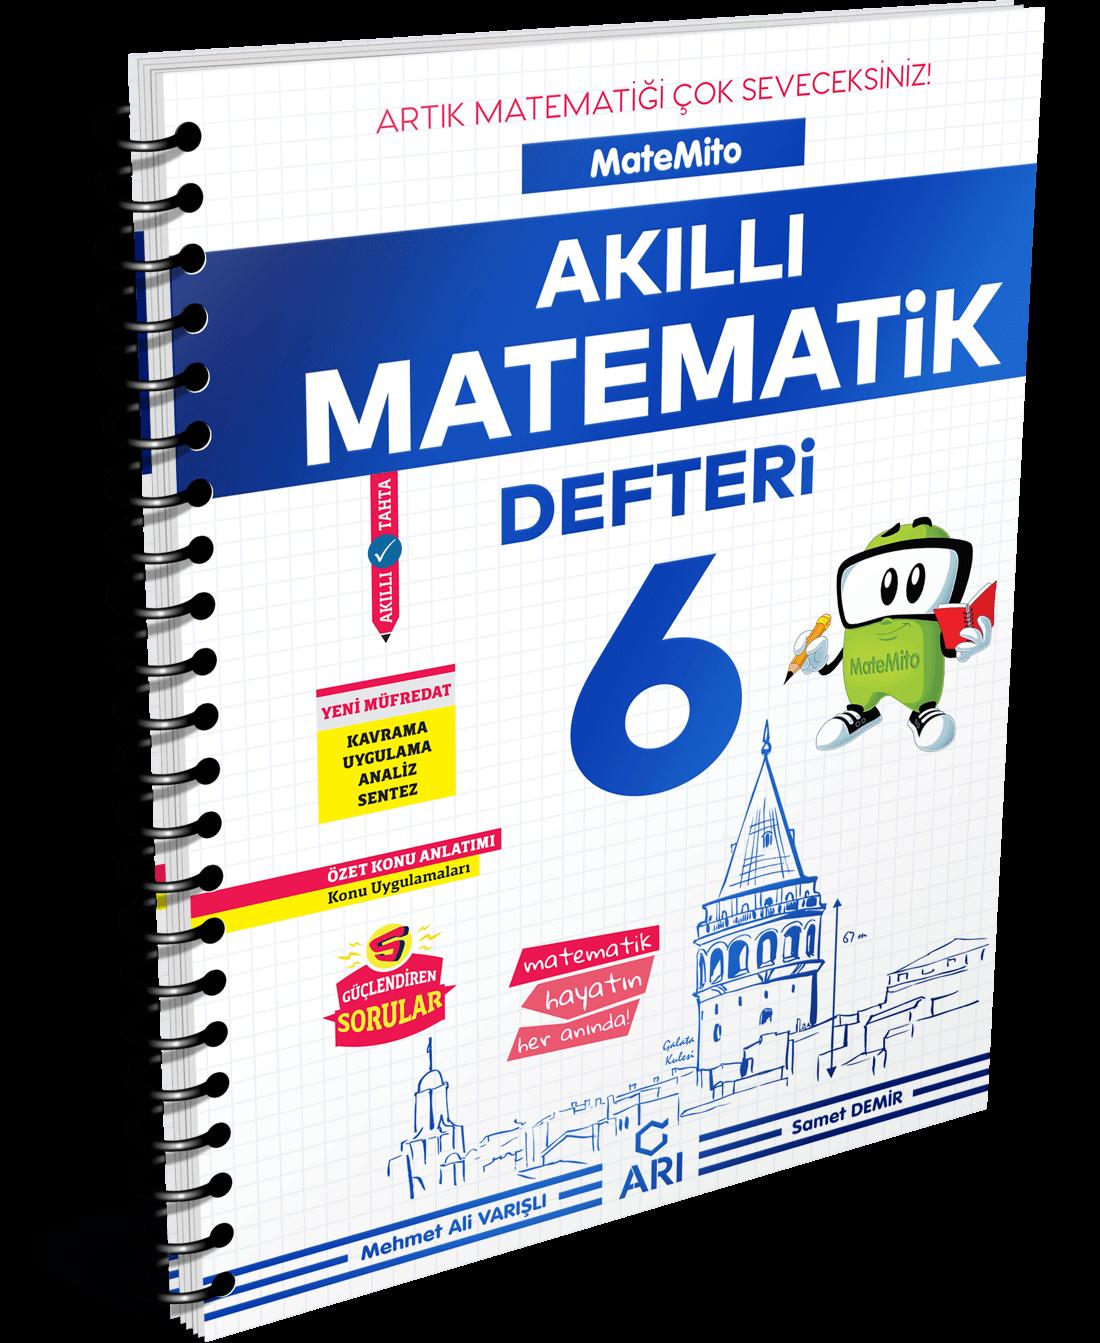 Matemito Akıllı Matematik Defteri 6. Sınıf